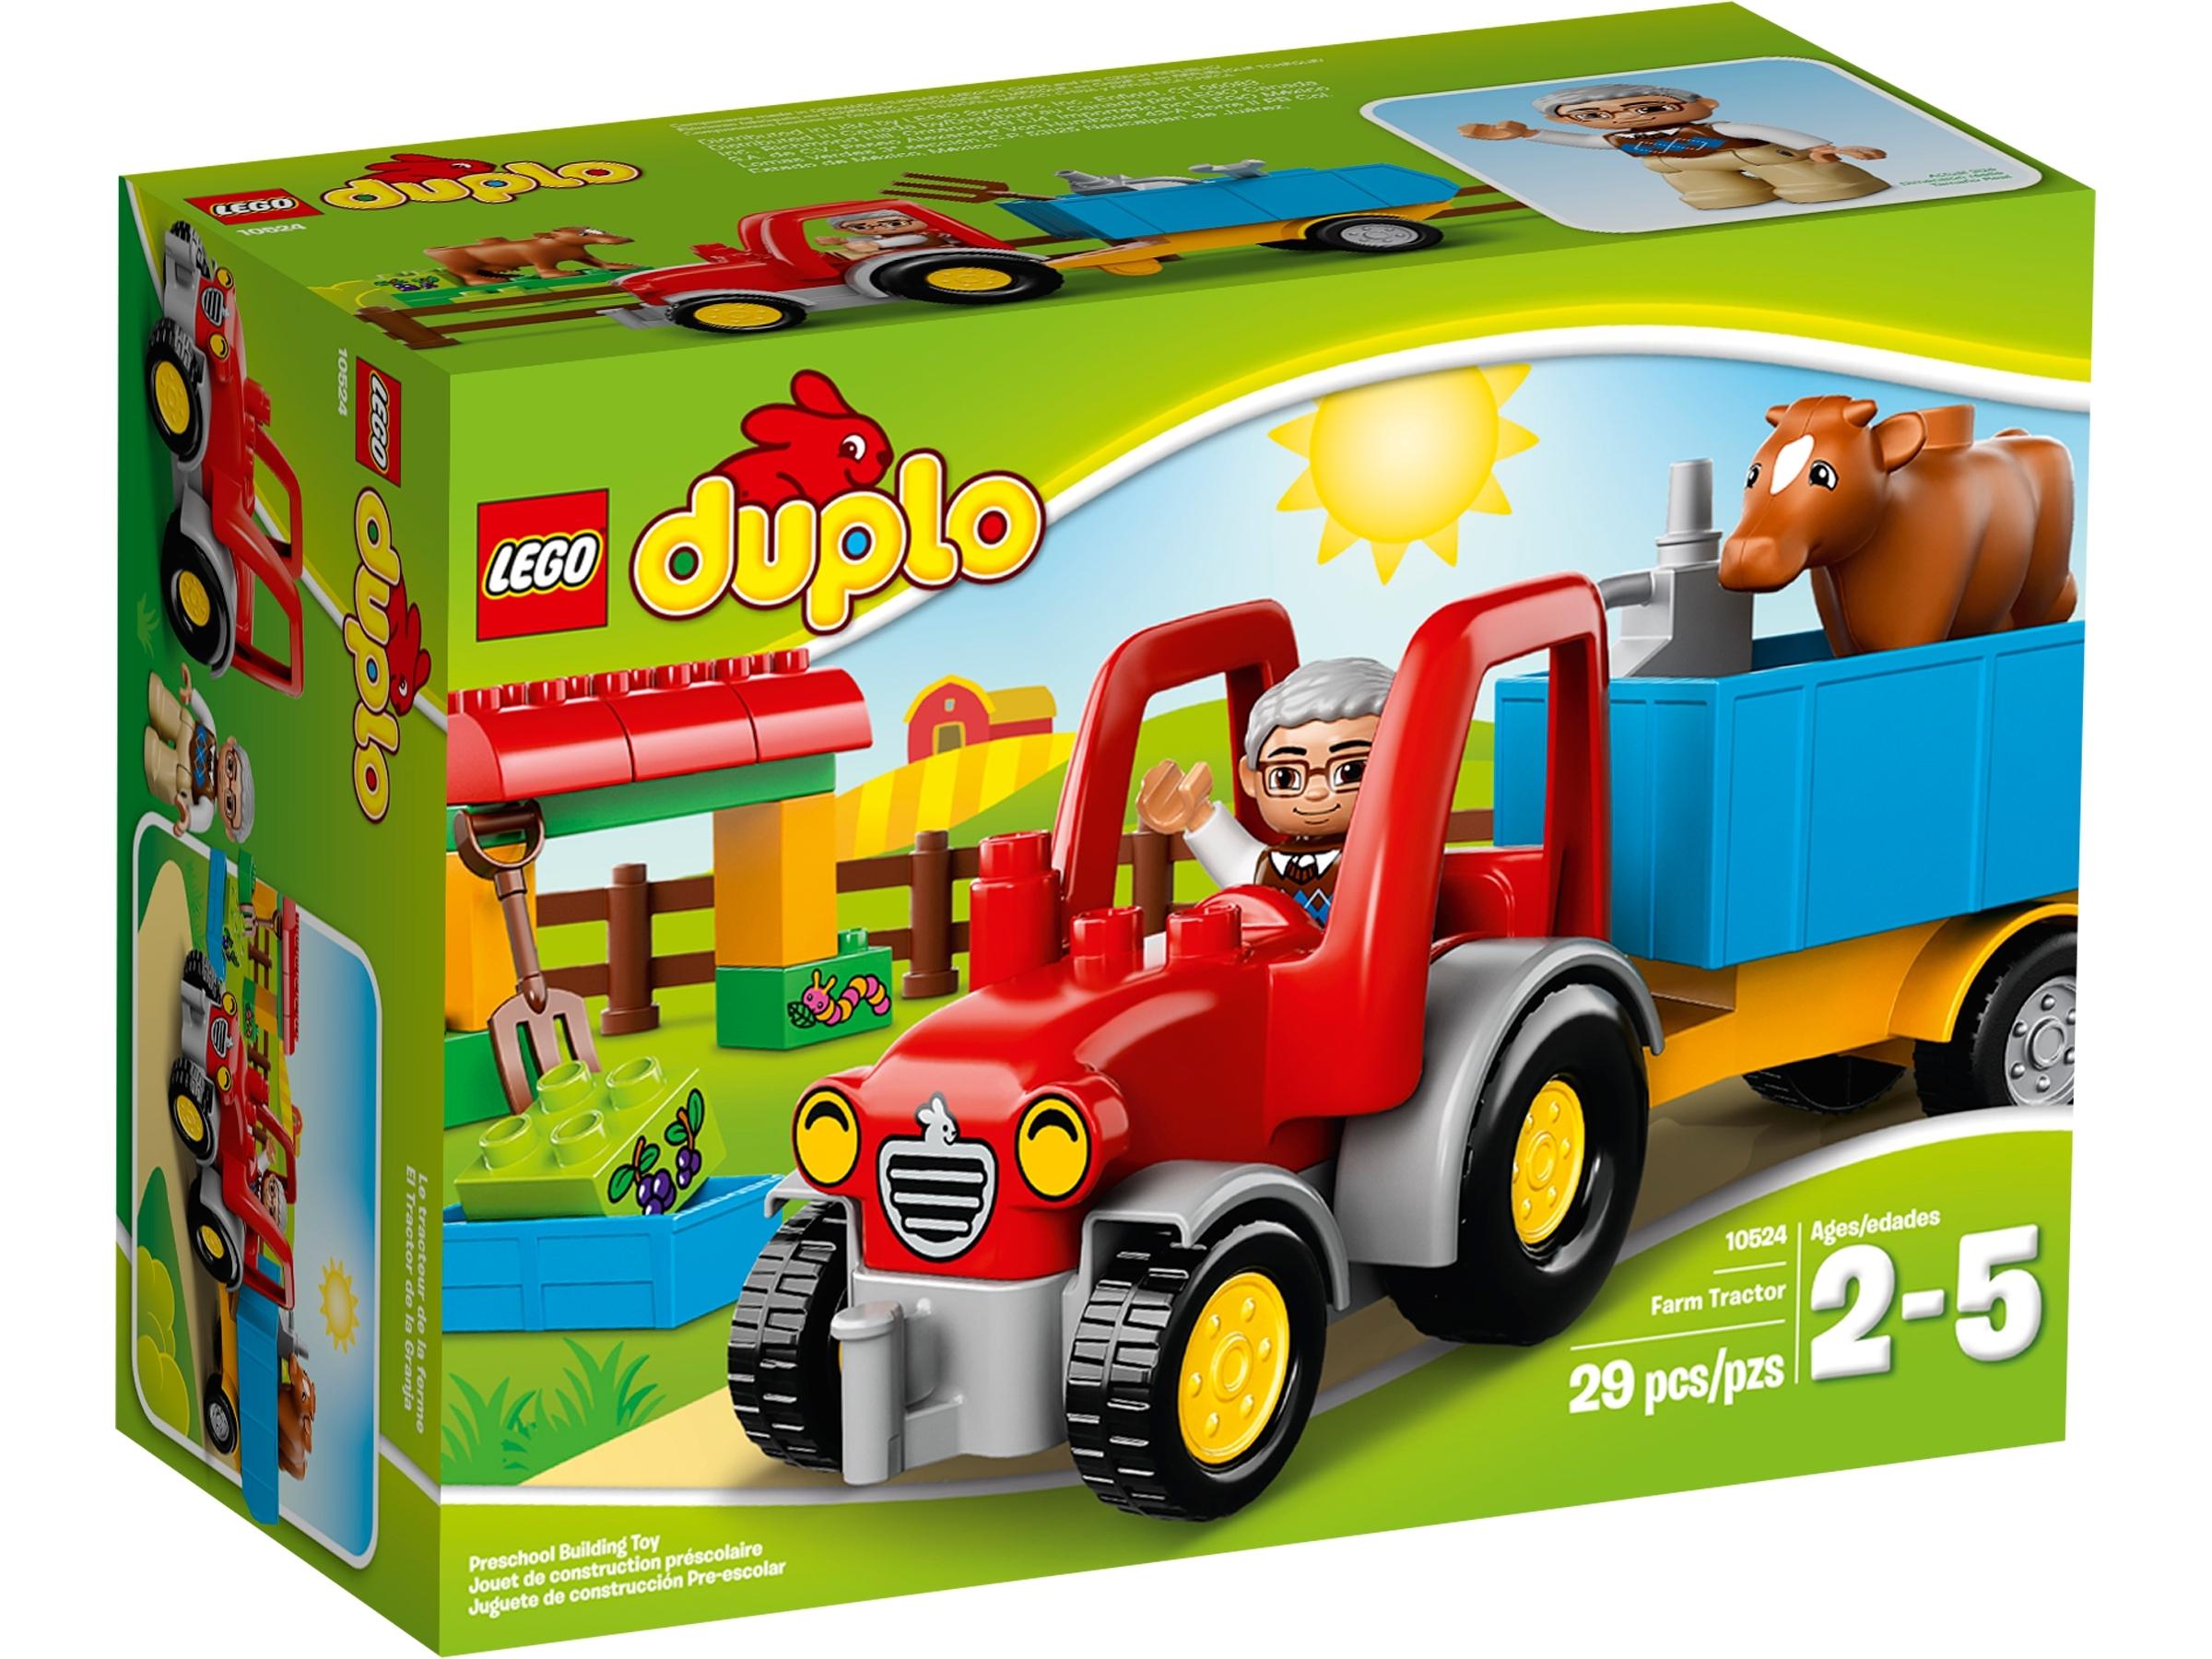 lego 10524 maatilan traktori